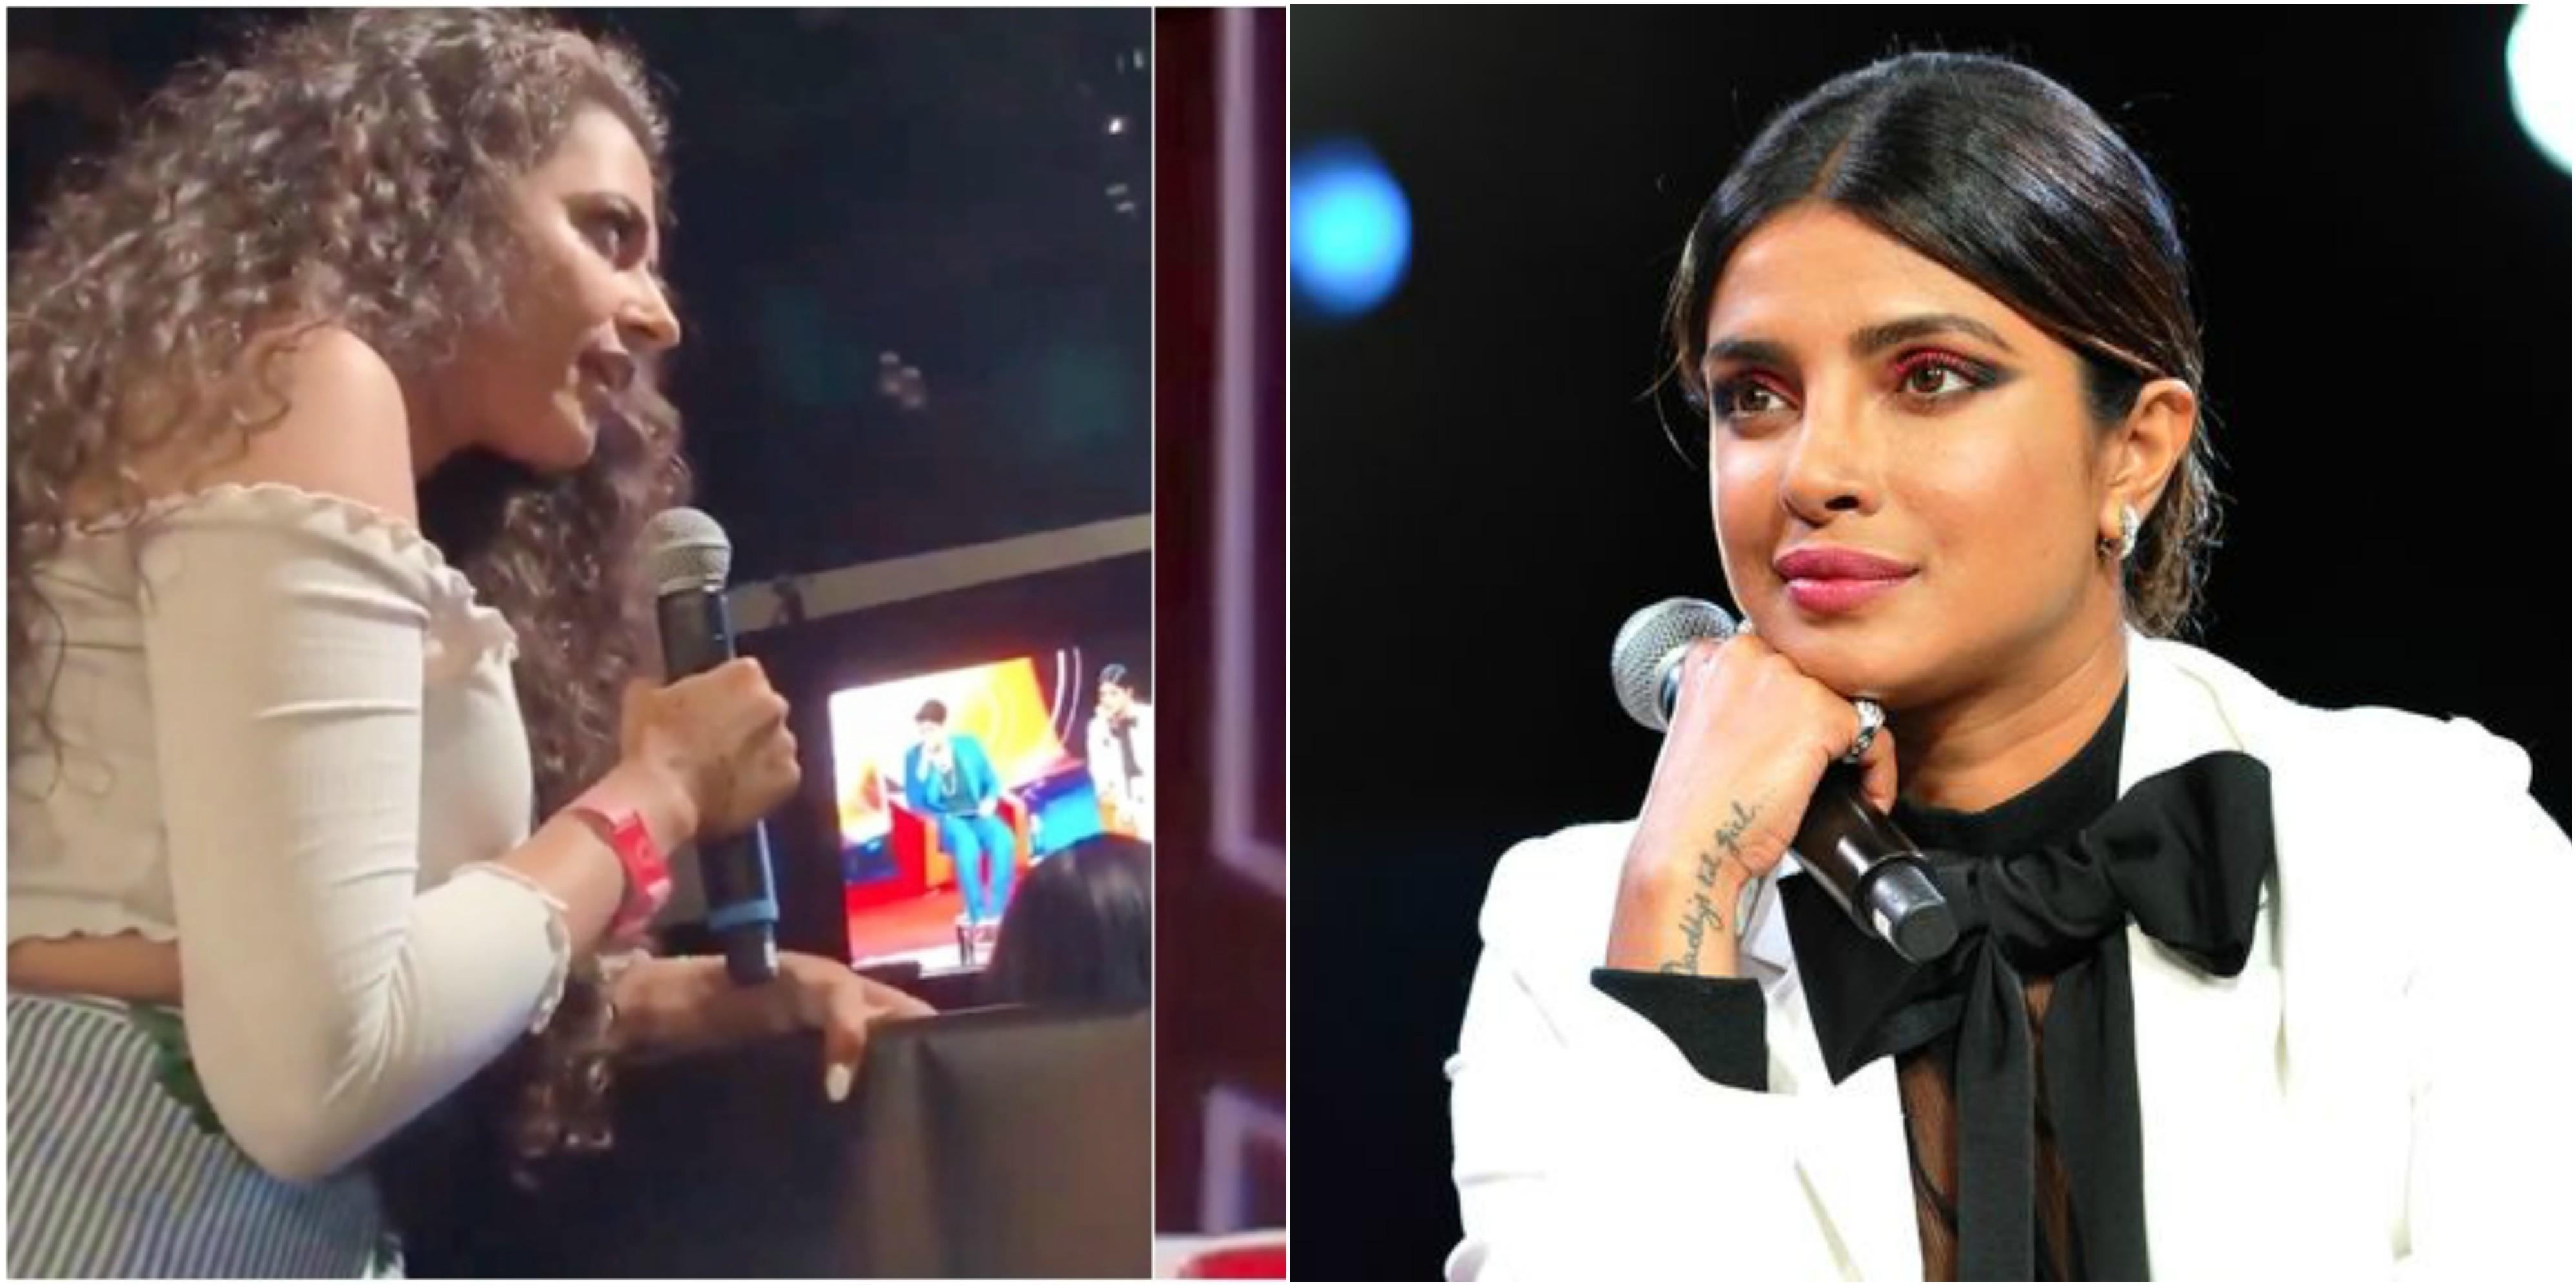 Priyanka Chopra Called Out For Her Hypocritical